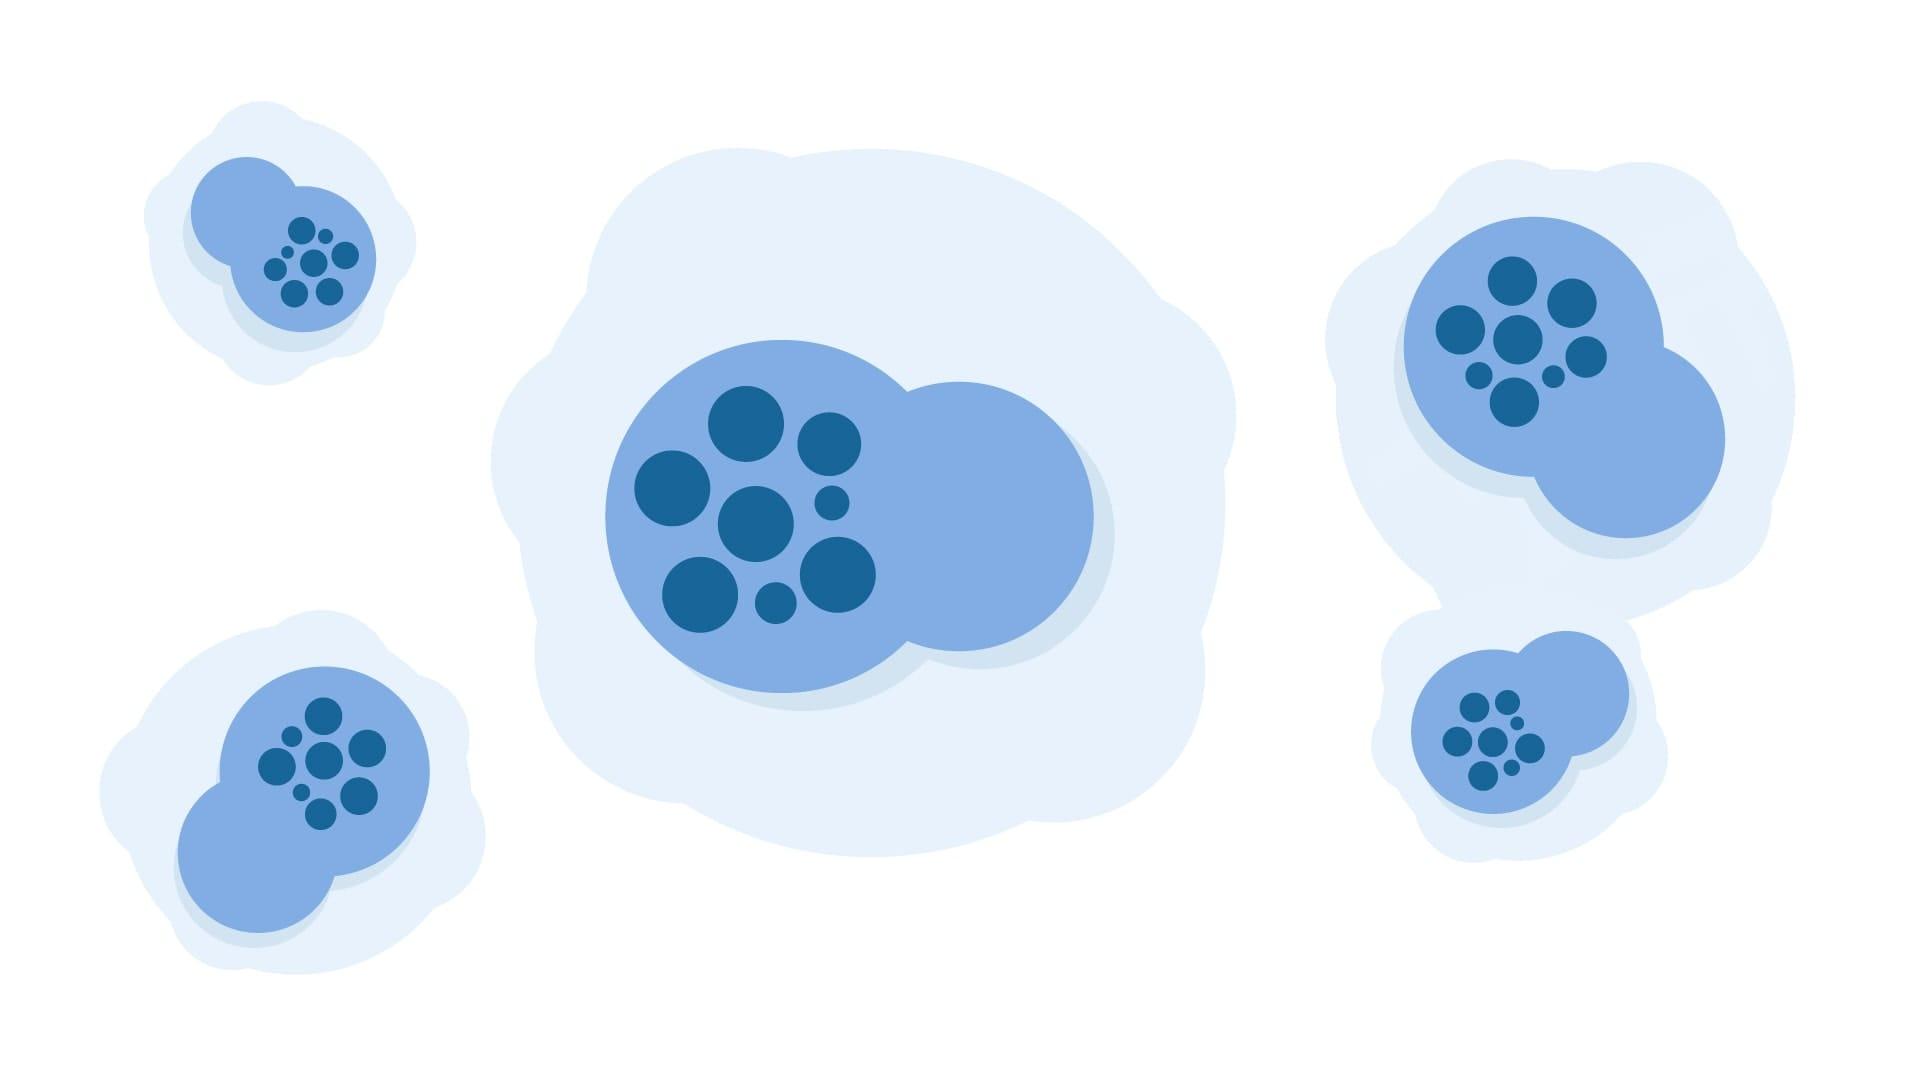 An illustration of chlamydia